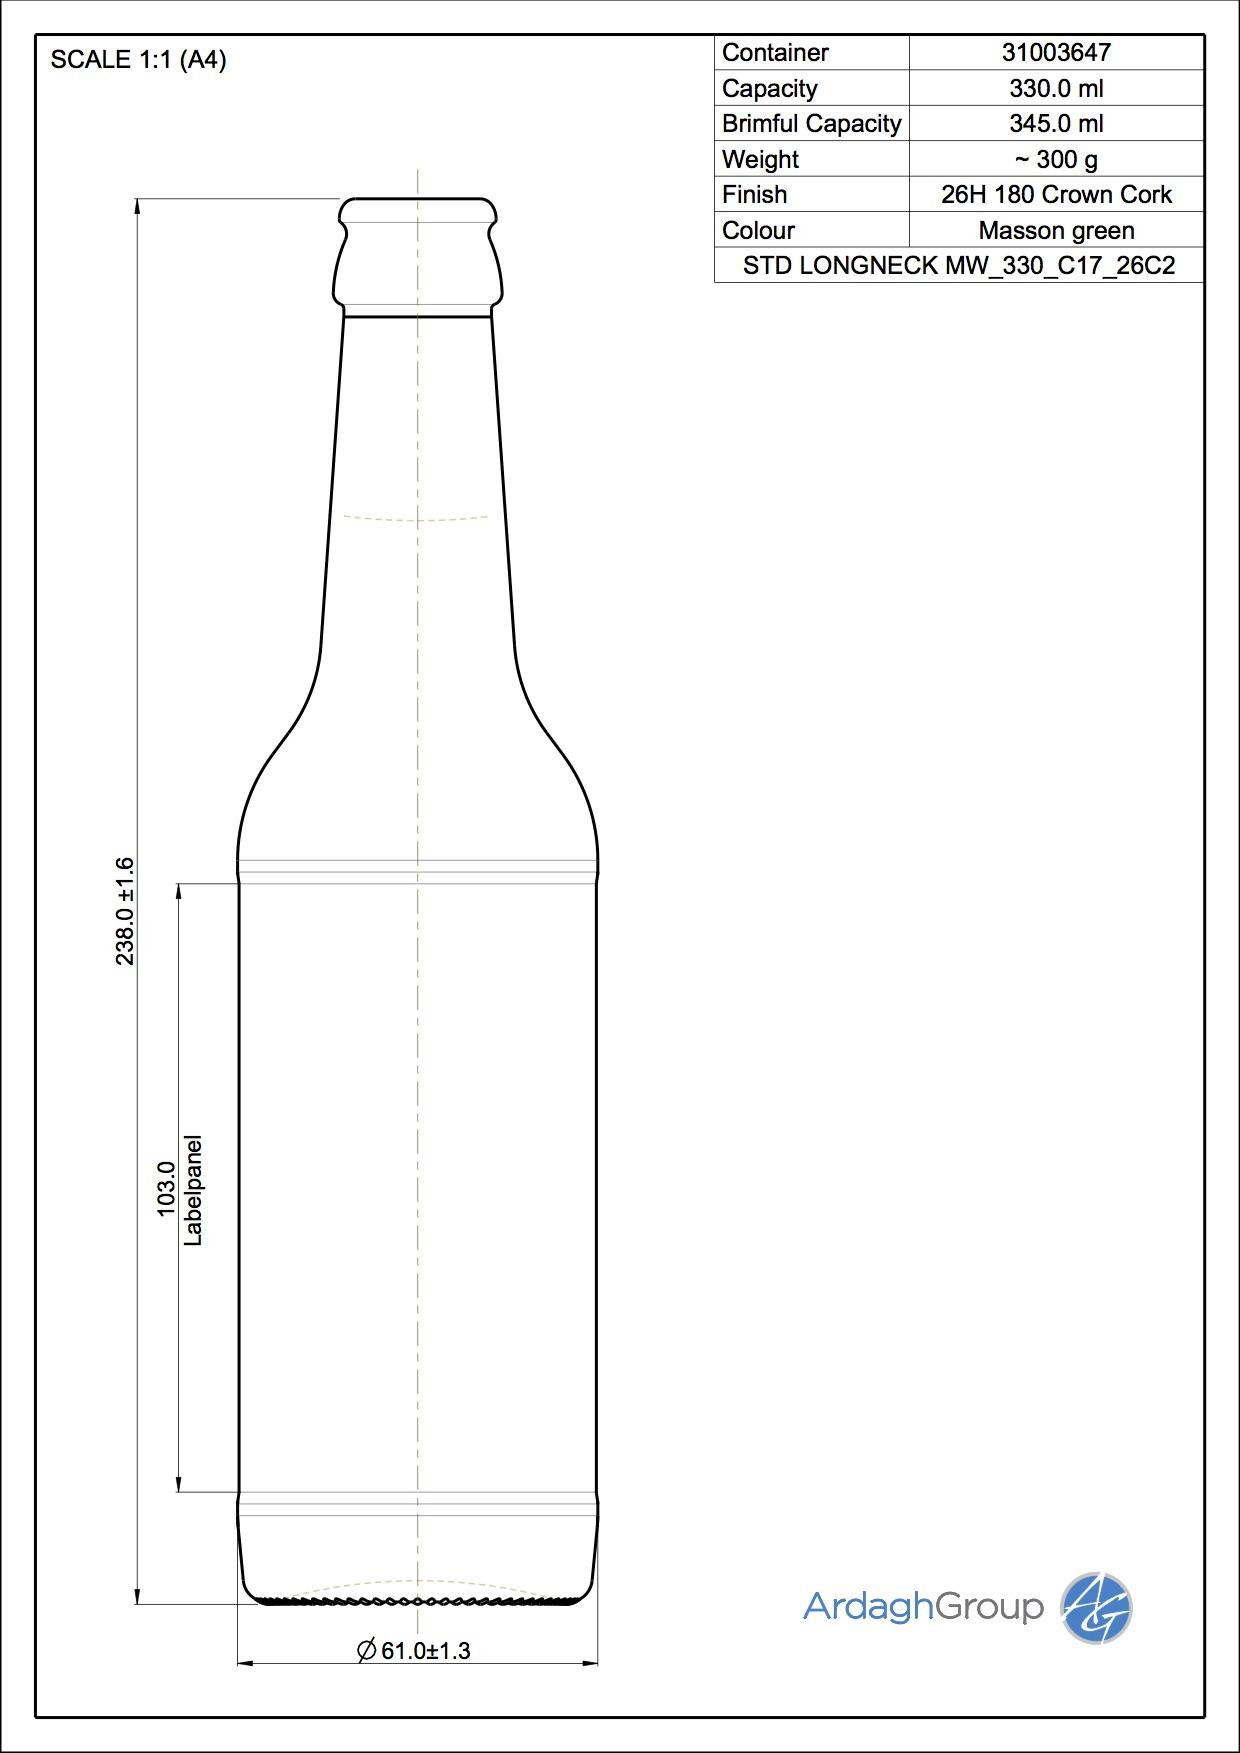 330ml Green Glass Longneck Returnable Beer Bottle 31003647